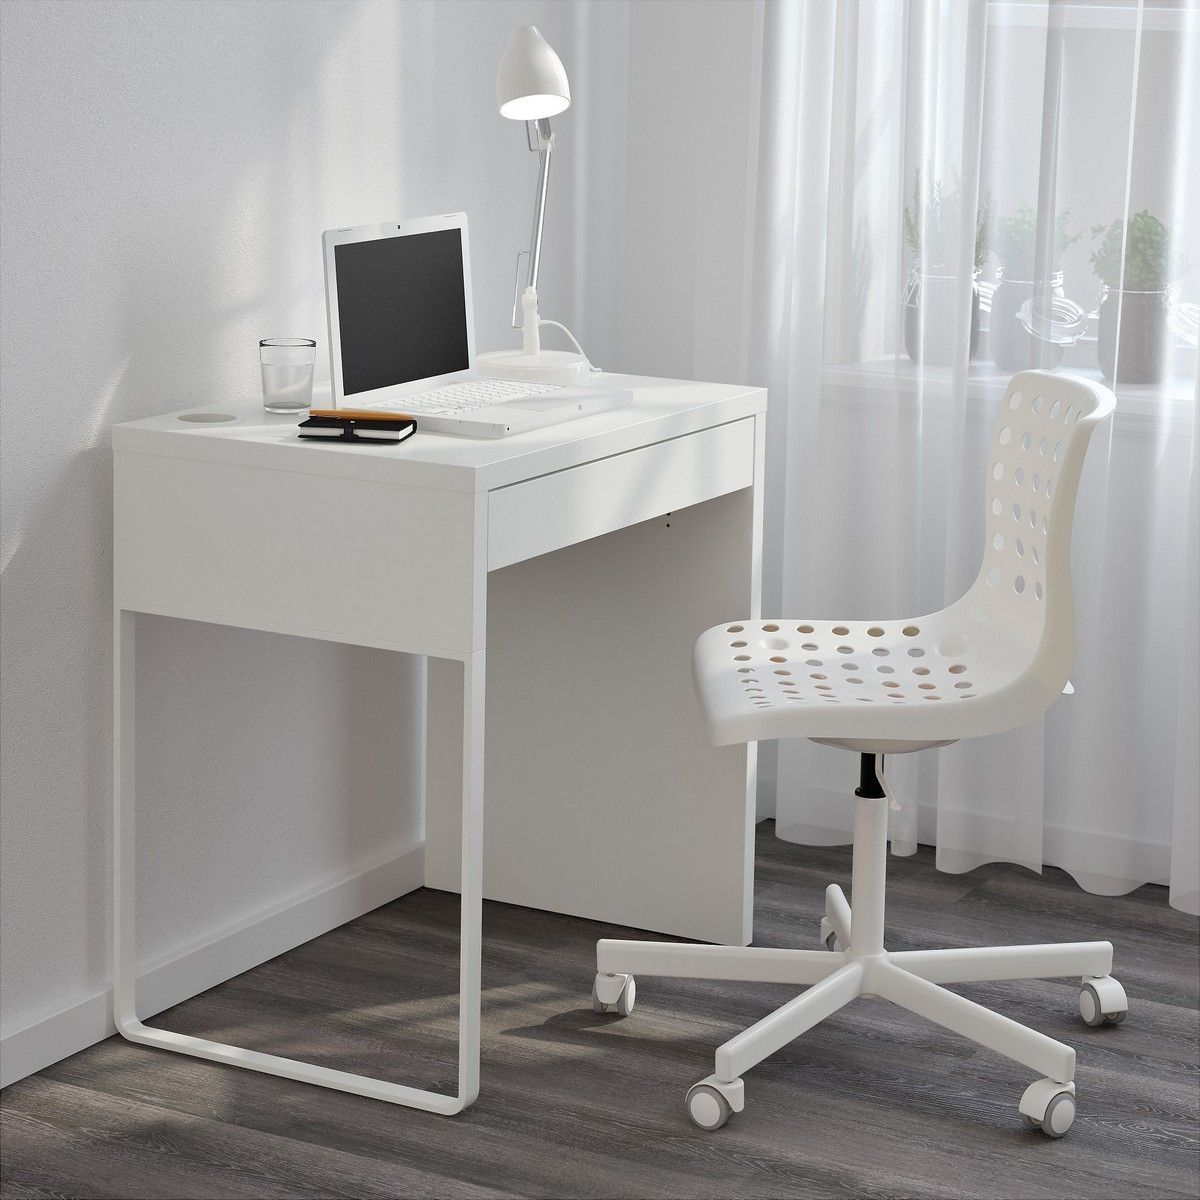 Small White Desk Desks For Small Spaces White Desk Bedroom